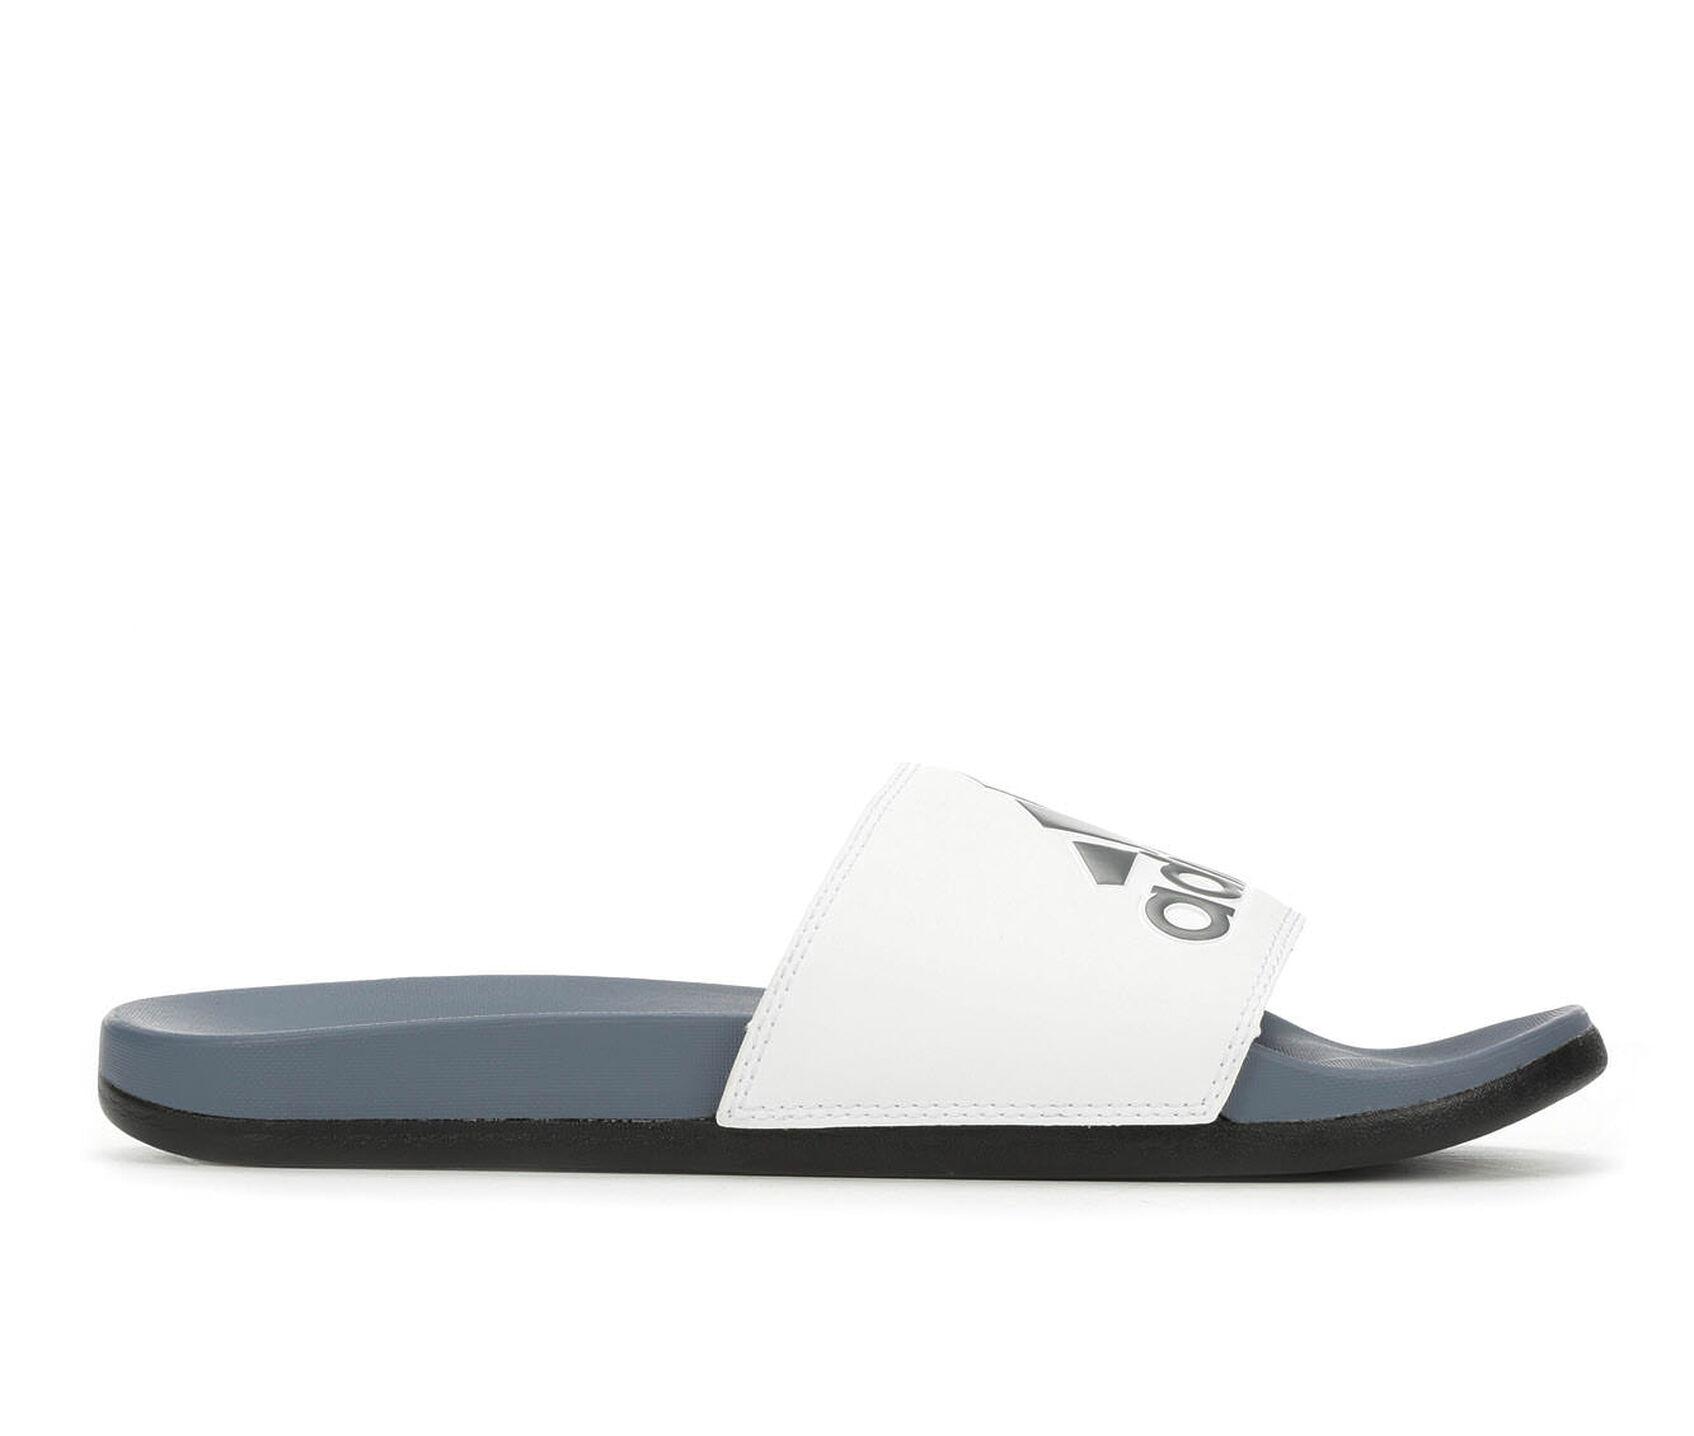 339821fce115 ... Adidas Adilette Cloudfoam + Logo Sport Slides. Previous